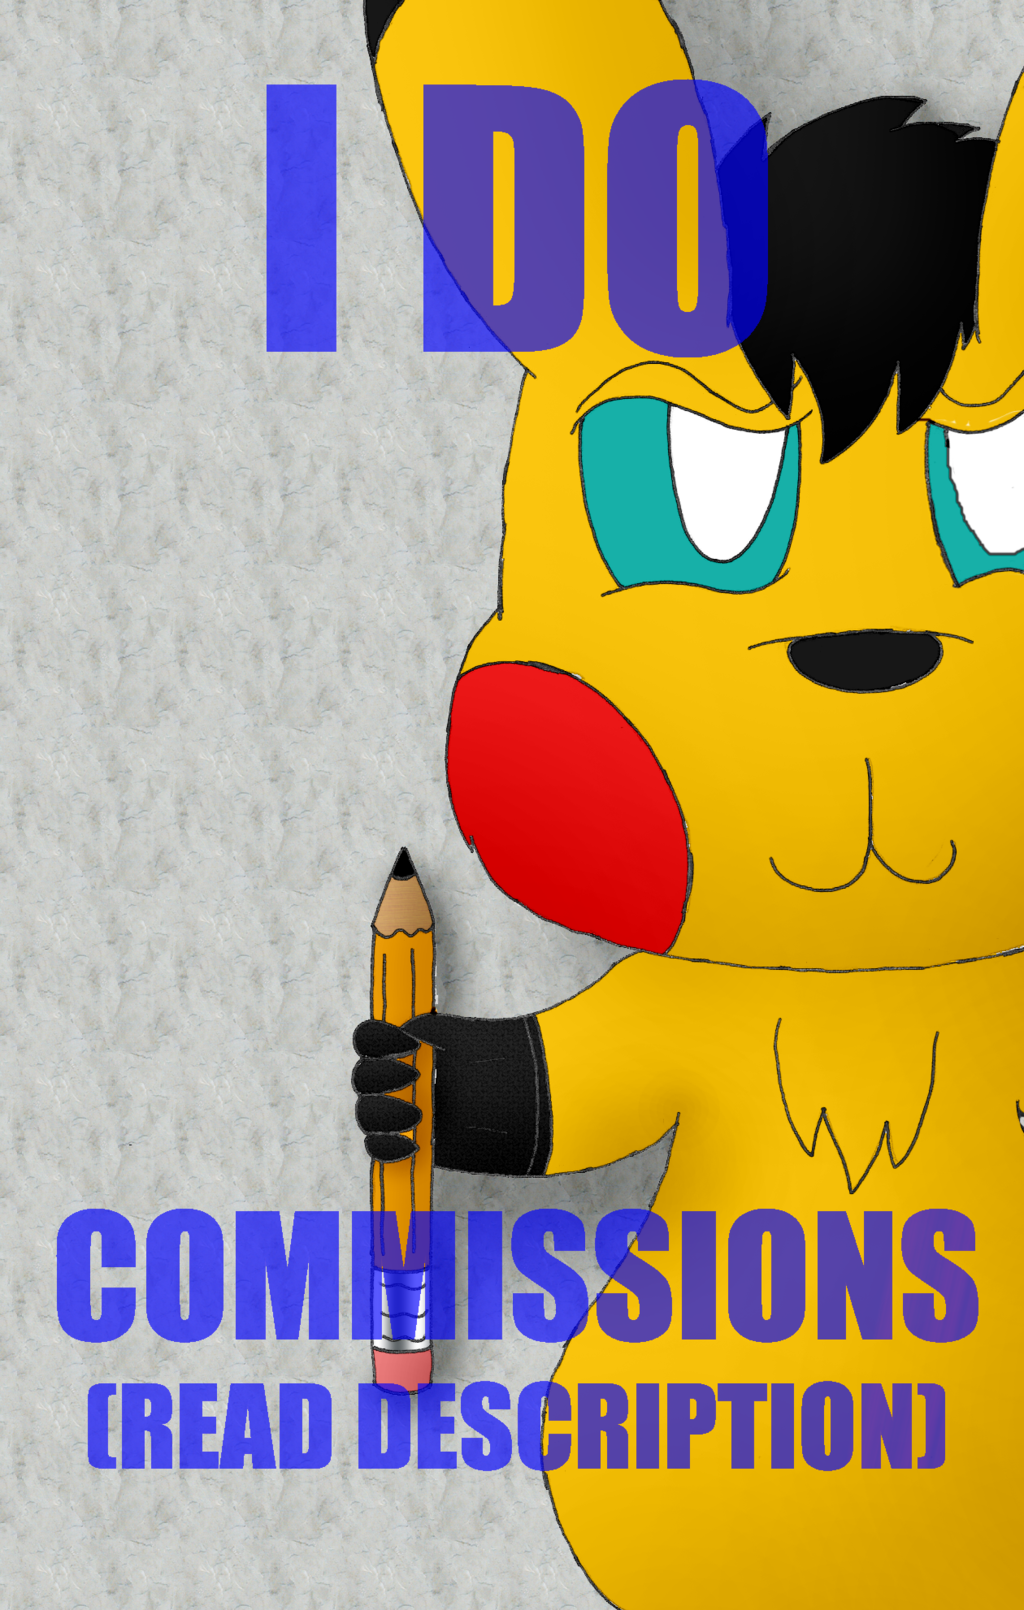 Most recent image: I Draw Commissions! (Read Description)